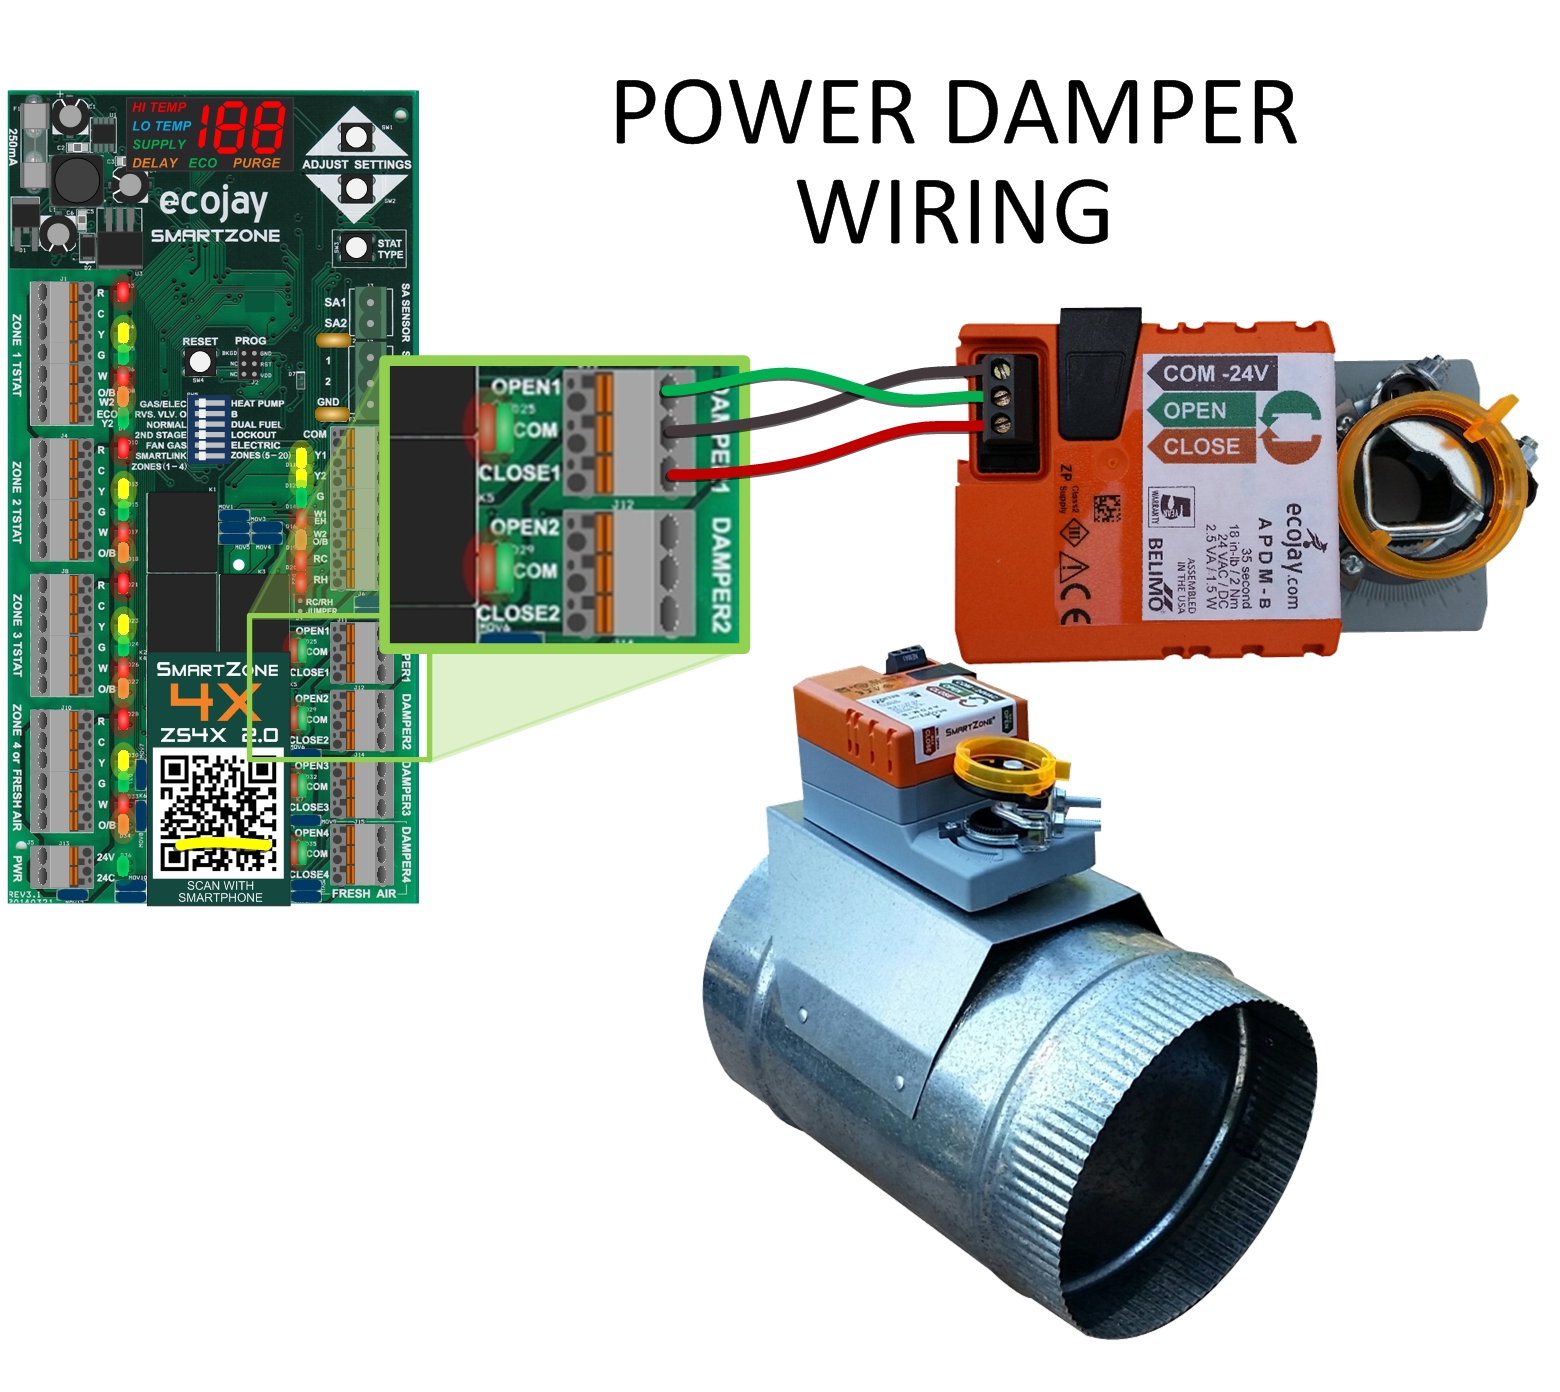 medium resolution of smartzone power open dampers wiring jpg